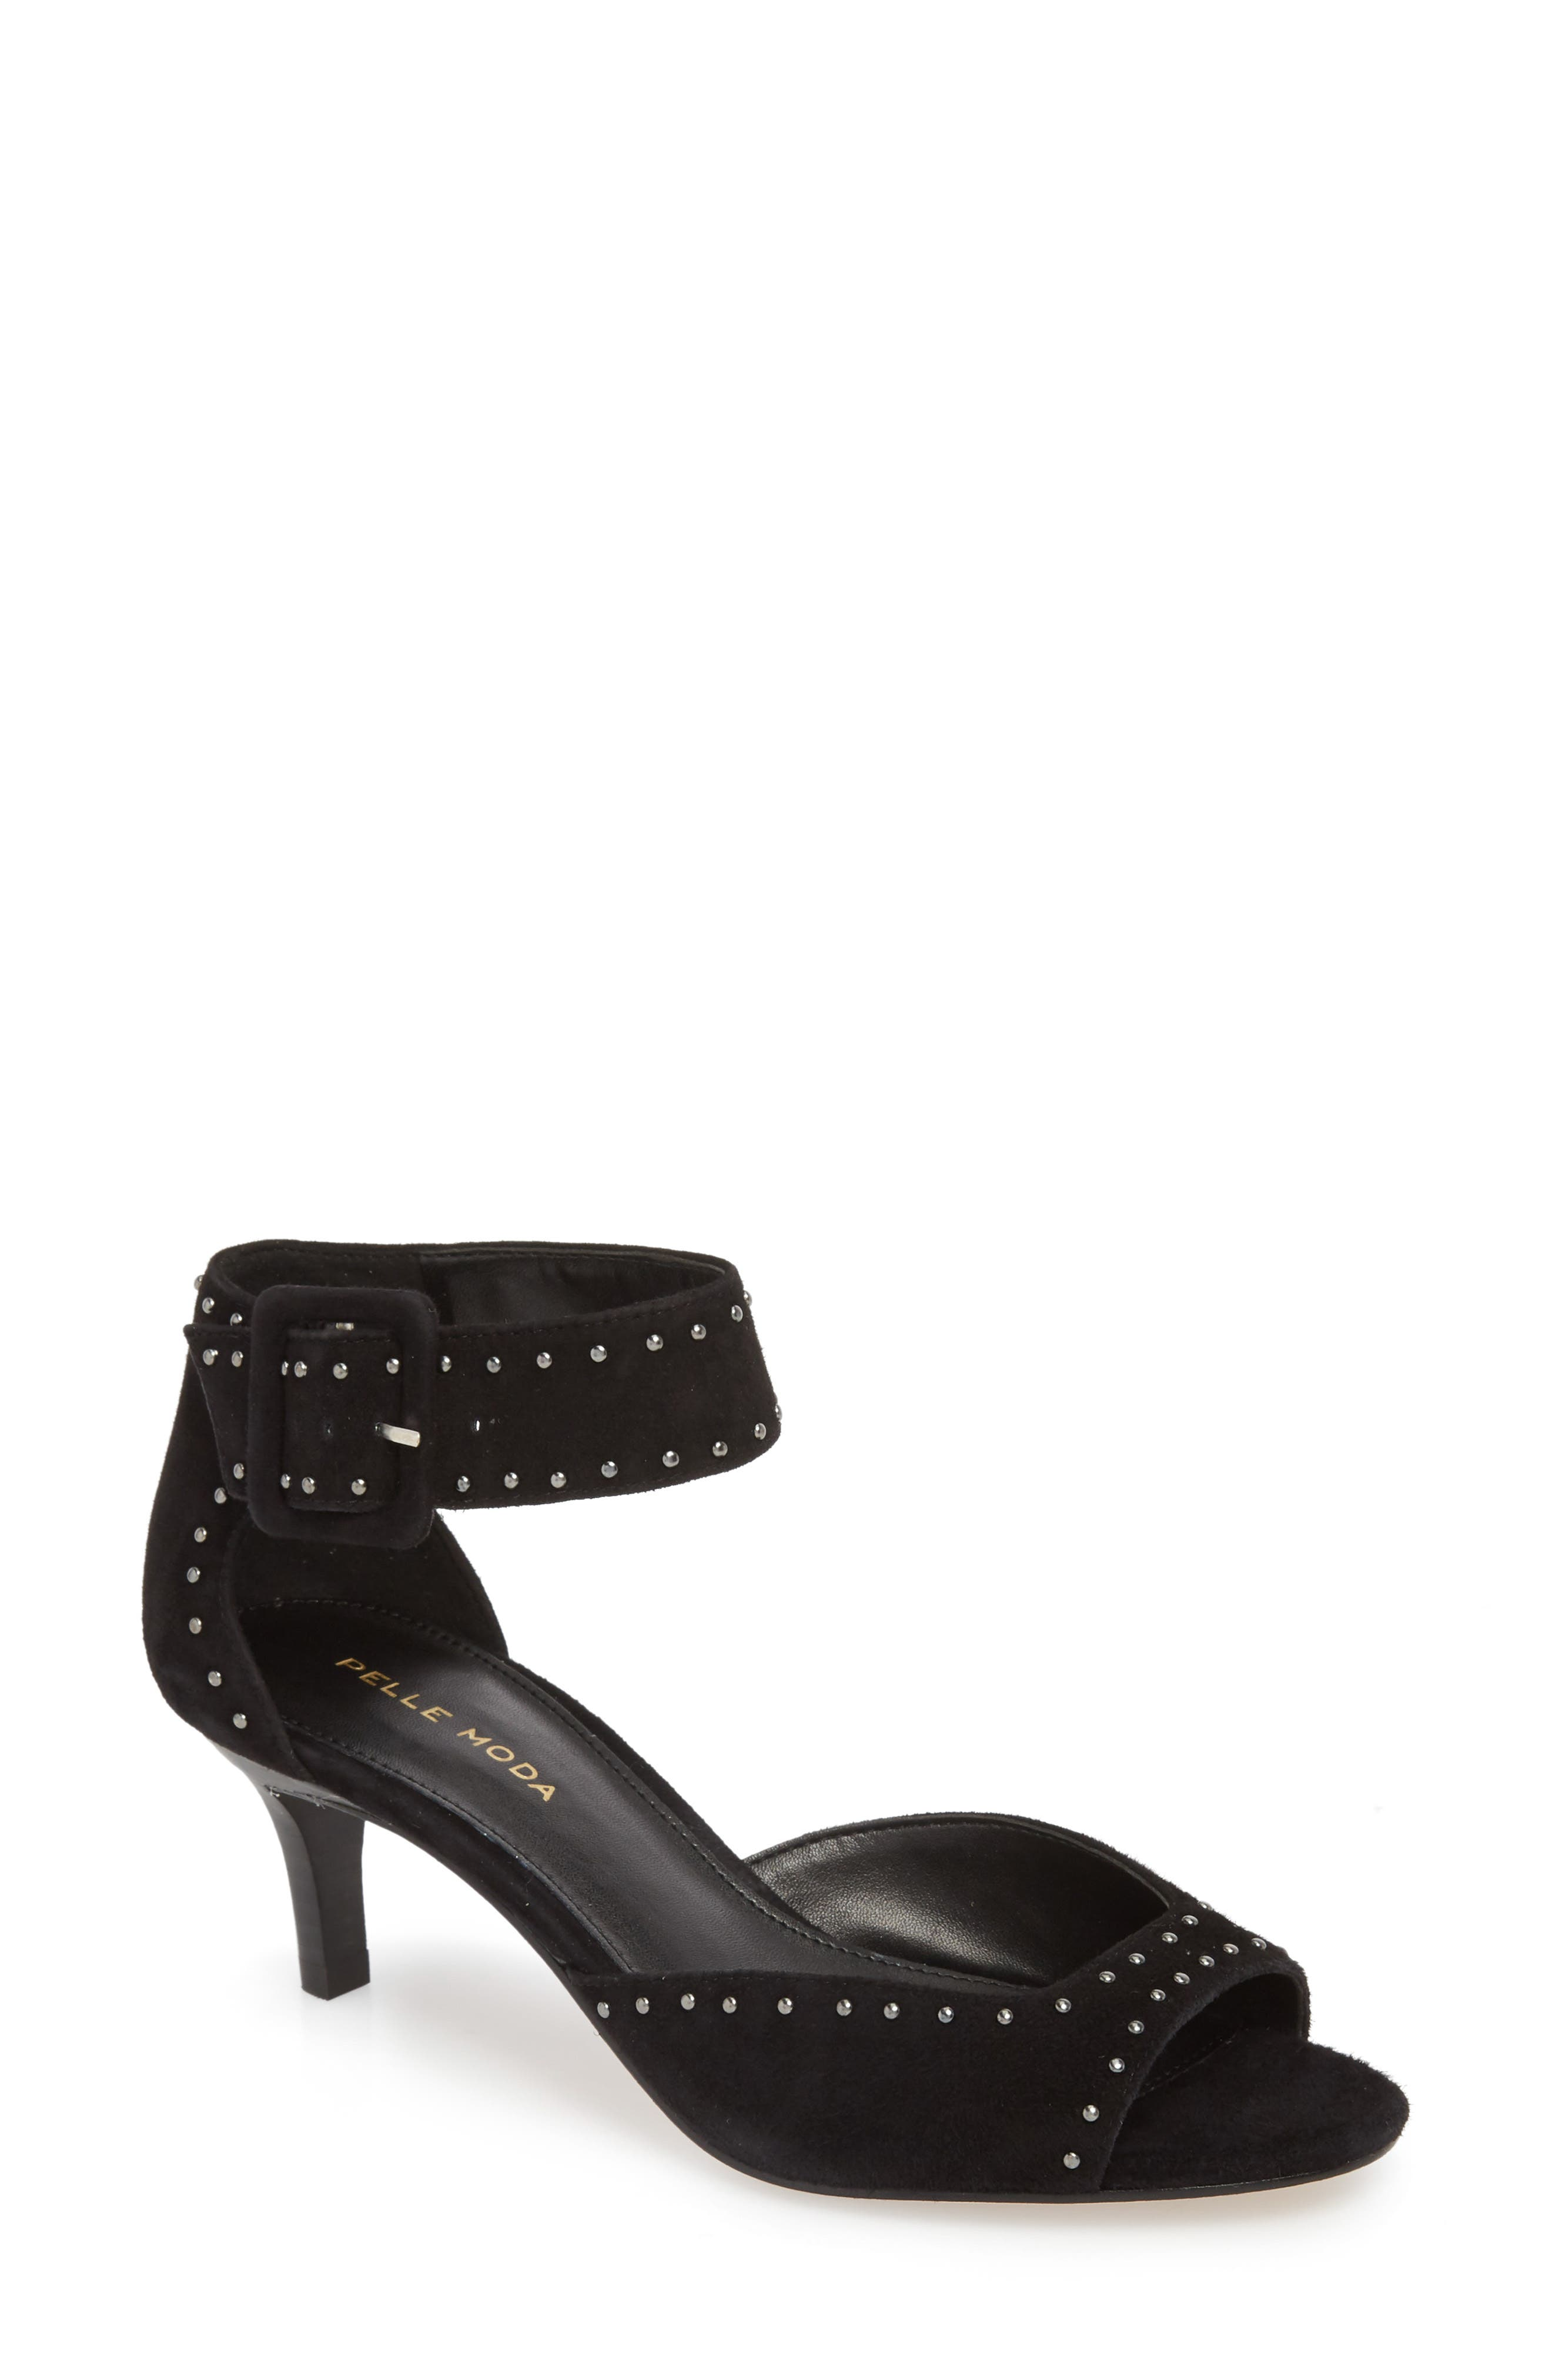 'Berlin' Sandal,                         Main,                         color, BLACK/ BLACK SUEDE